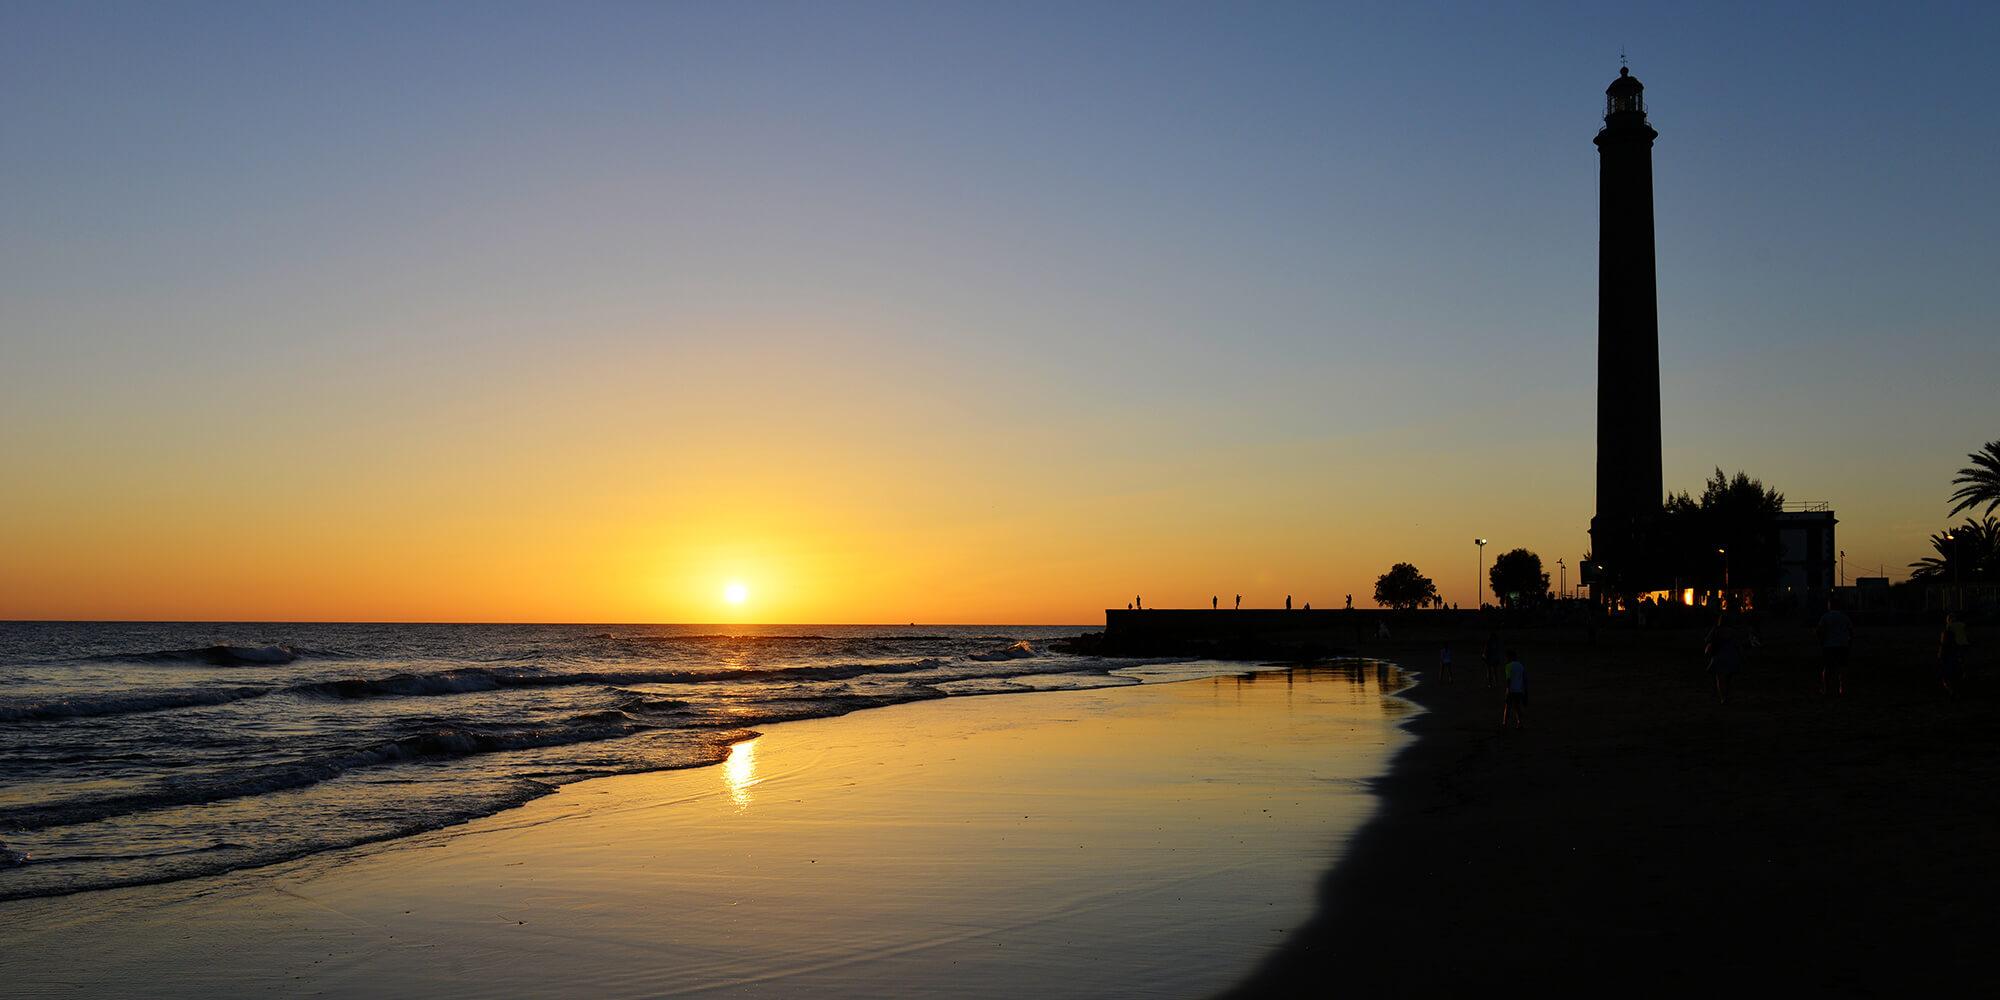 GranCanariaFoto-Faro-Maspalomas-Sonnenuntergang-Dirk-Holst-DHSTUDIO-168